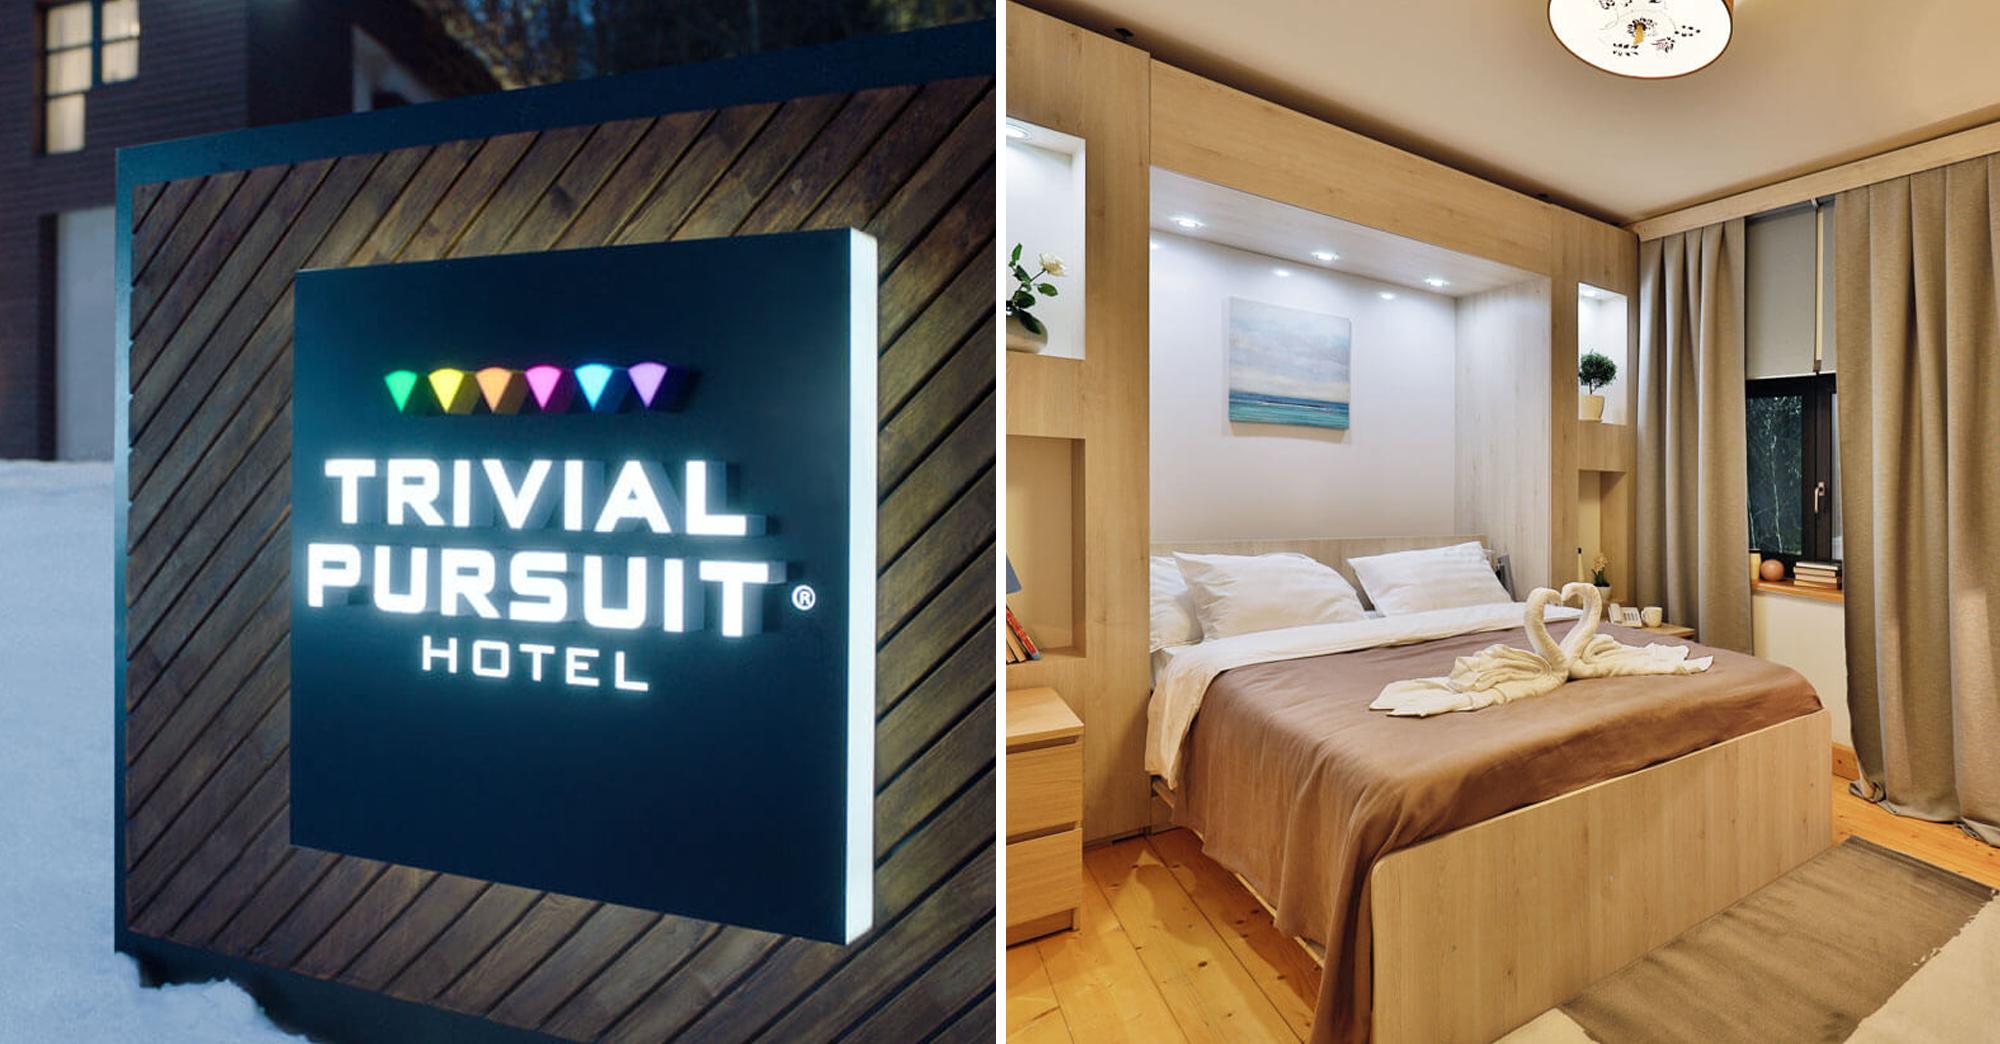 trivial-pursuit-hotel-hasbro